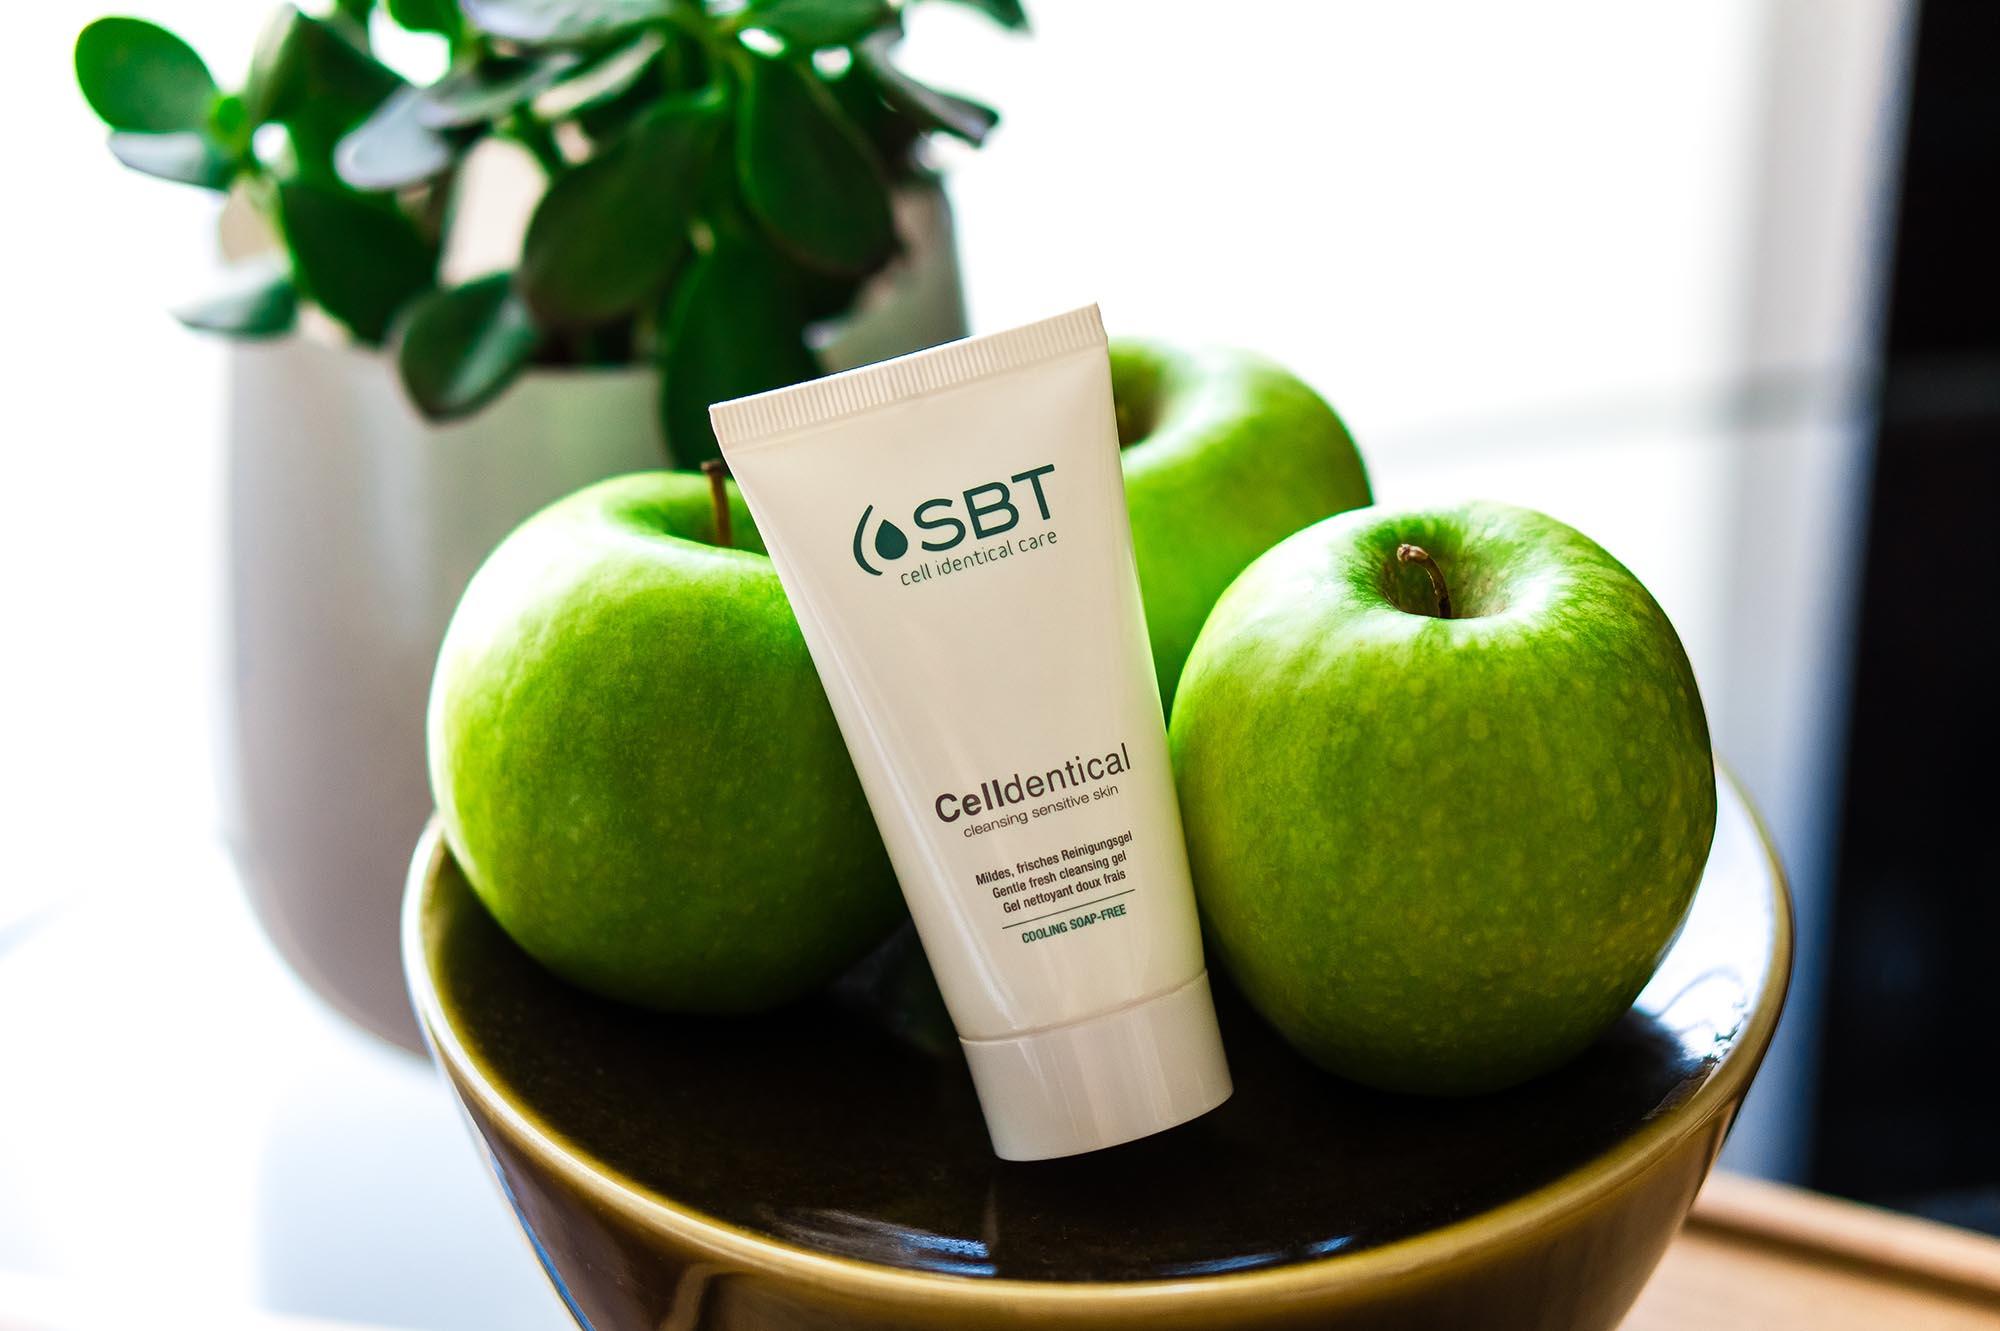 Польза и вред умывания: SBT Celldentical Cleansing Gel